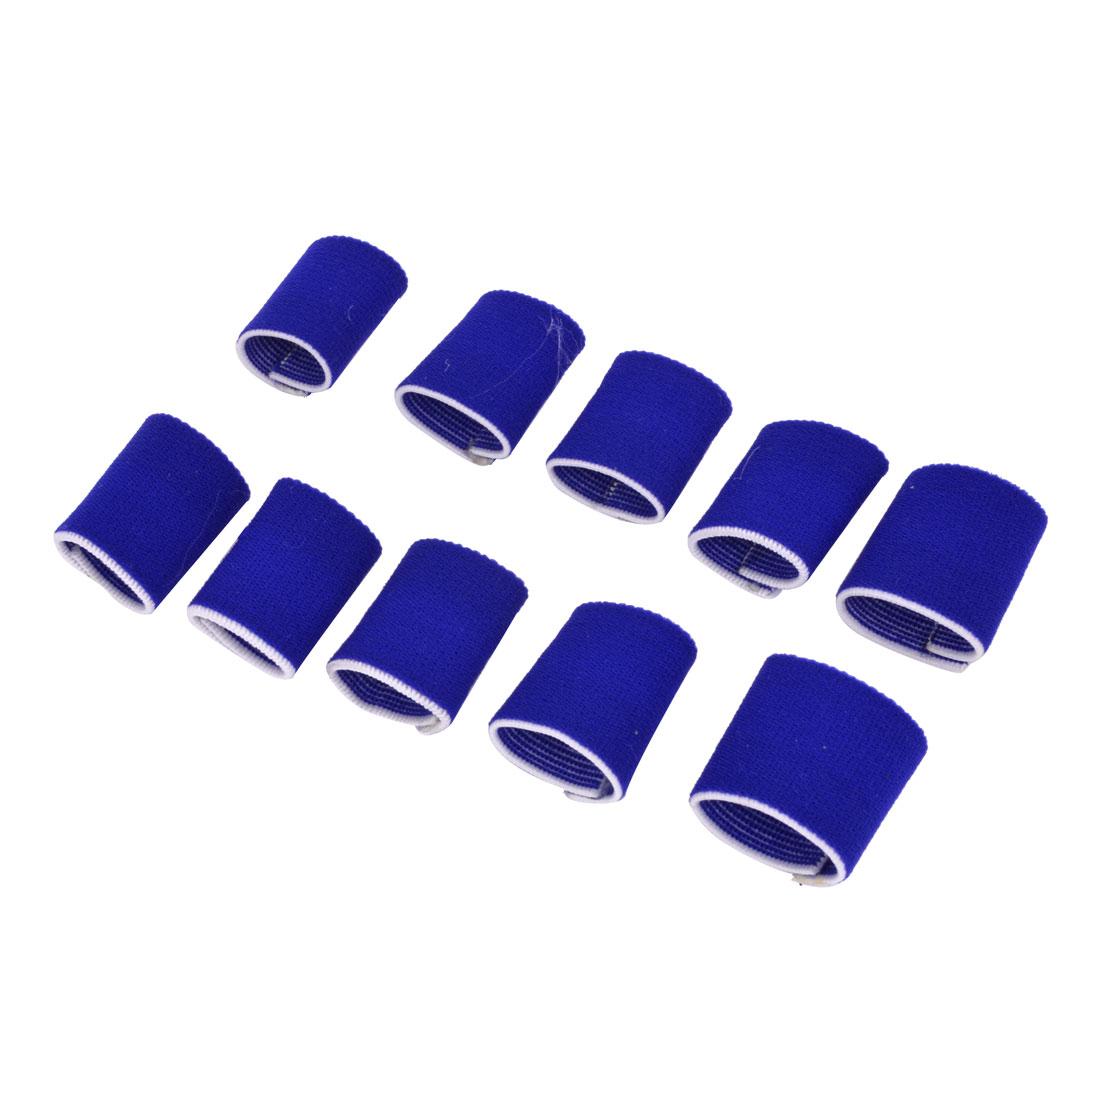 Royal Blue Elastic Sports Finger Protector Sleeve 10 Pcs